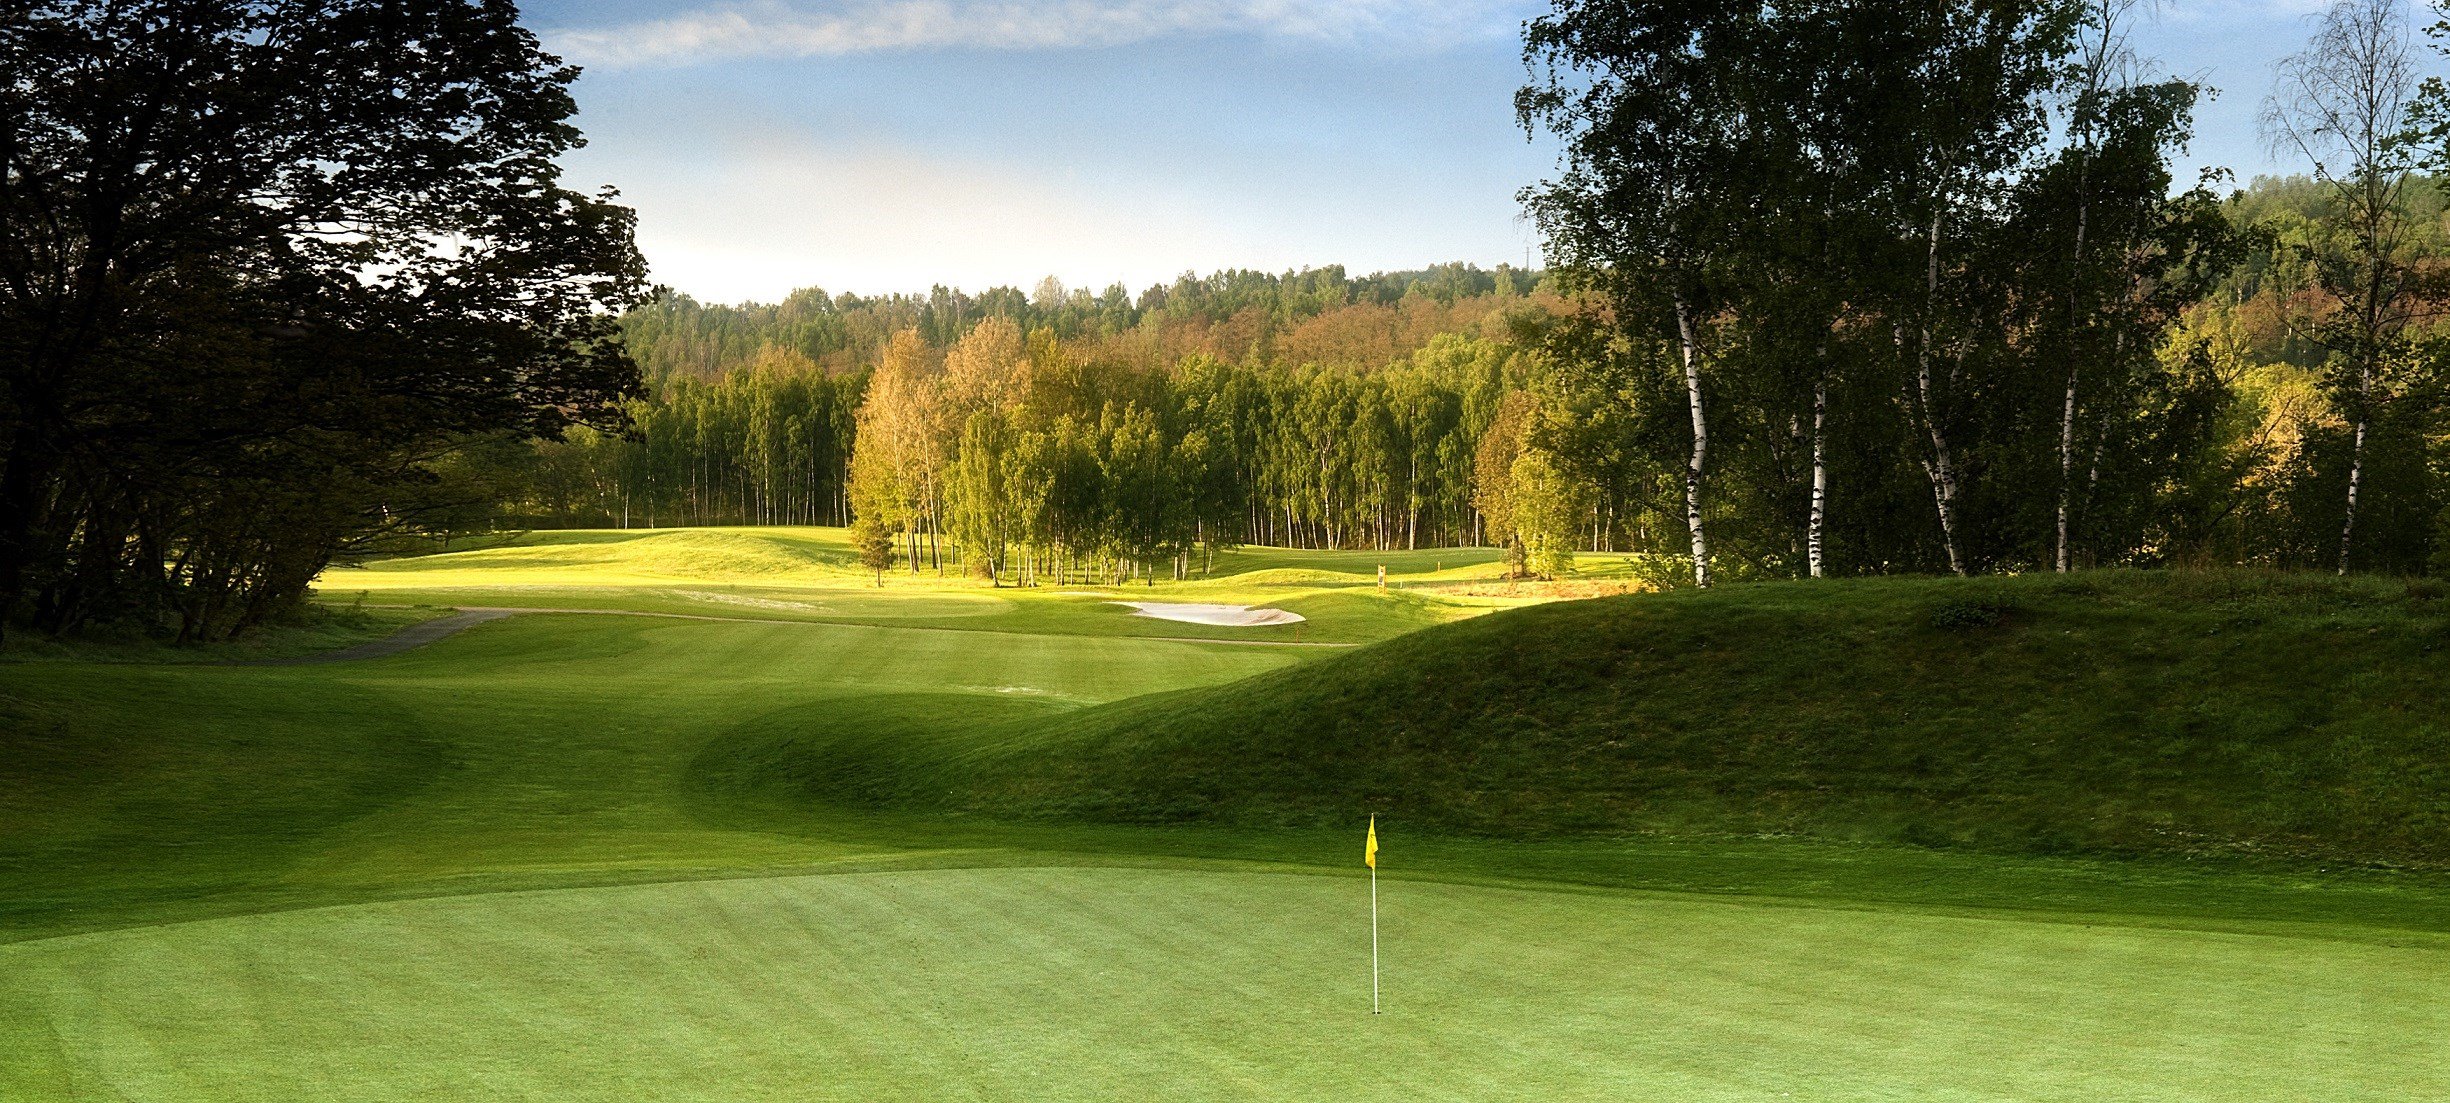 Golf_Greensgate_02.jpg